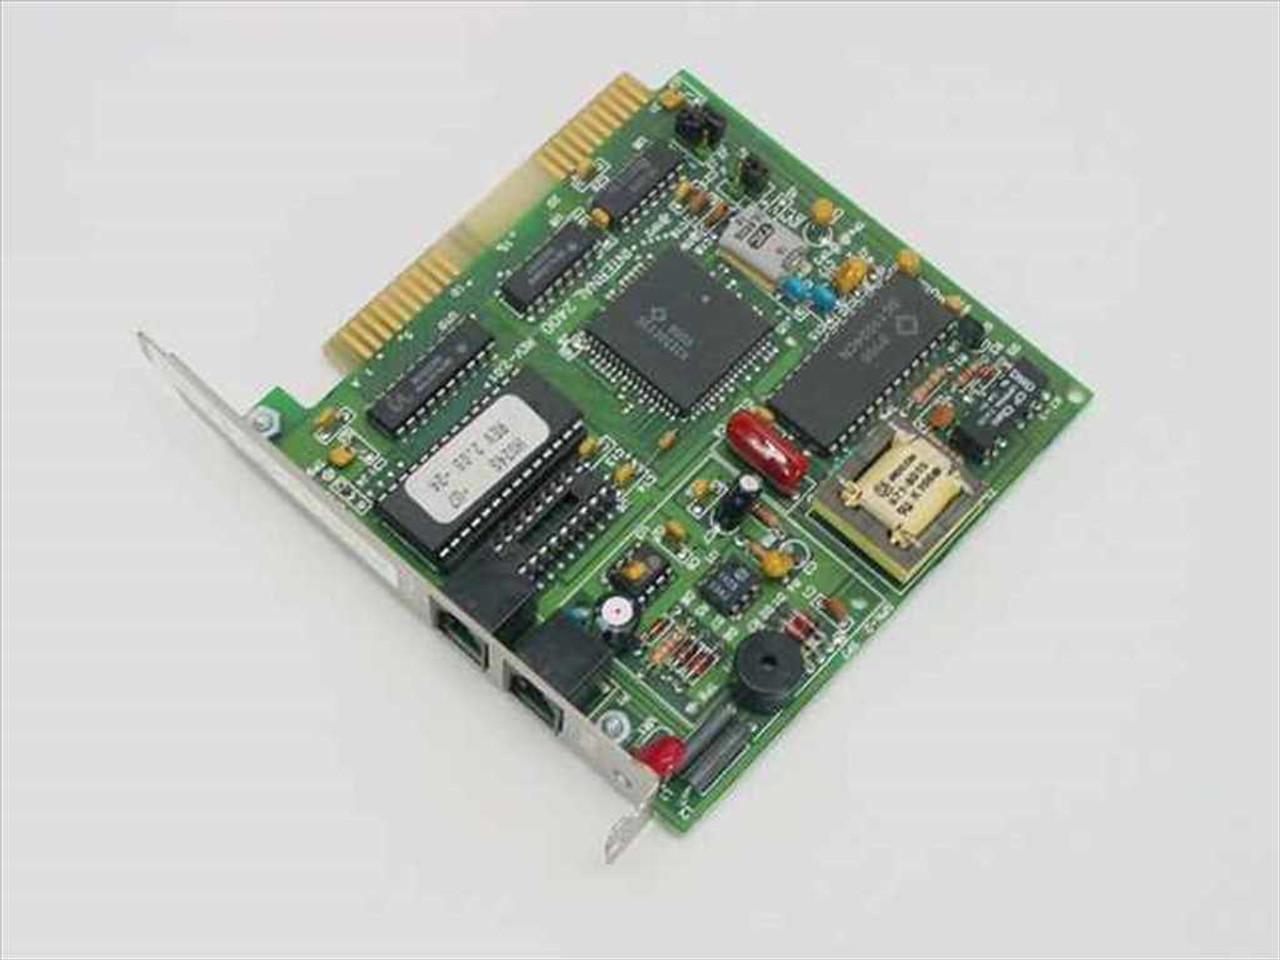 KLH HU24S 8 Bit ISA 2400 Baud Internal Modem